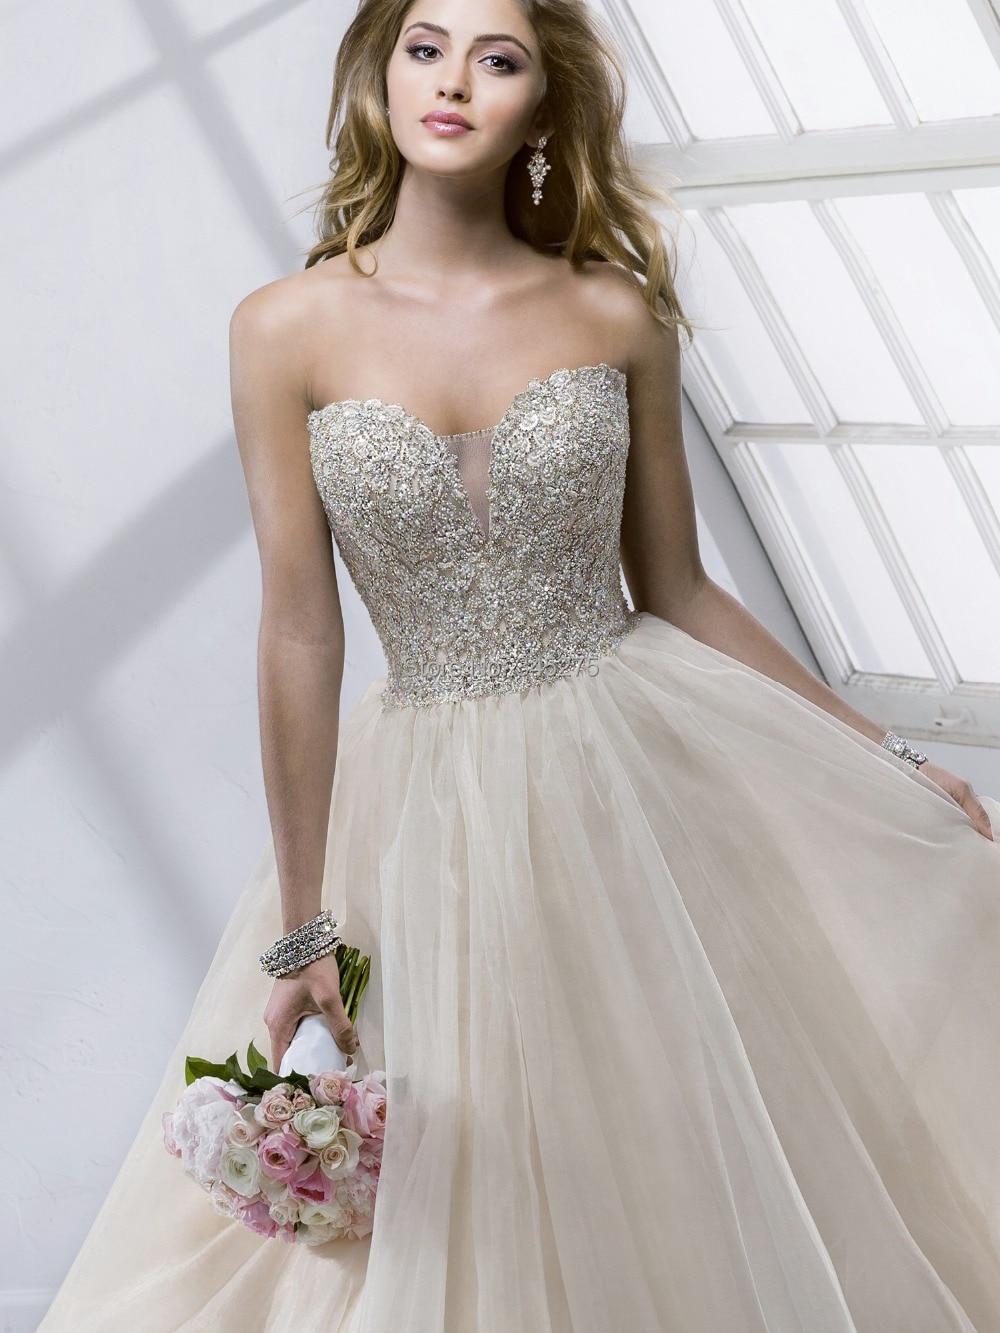 bridesmaid silver dresses silver wedding dresses Silver Bridesmaid Dresses 2 Dressizer